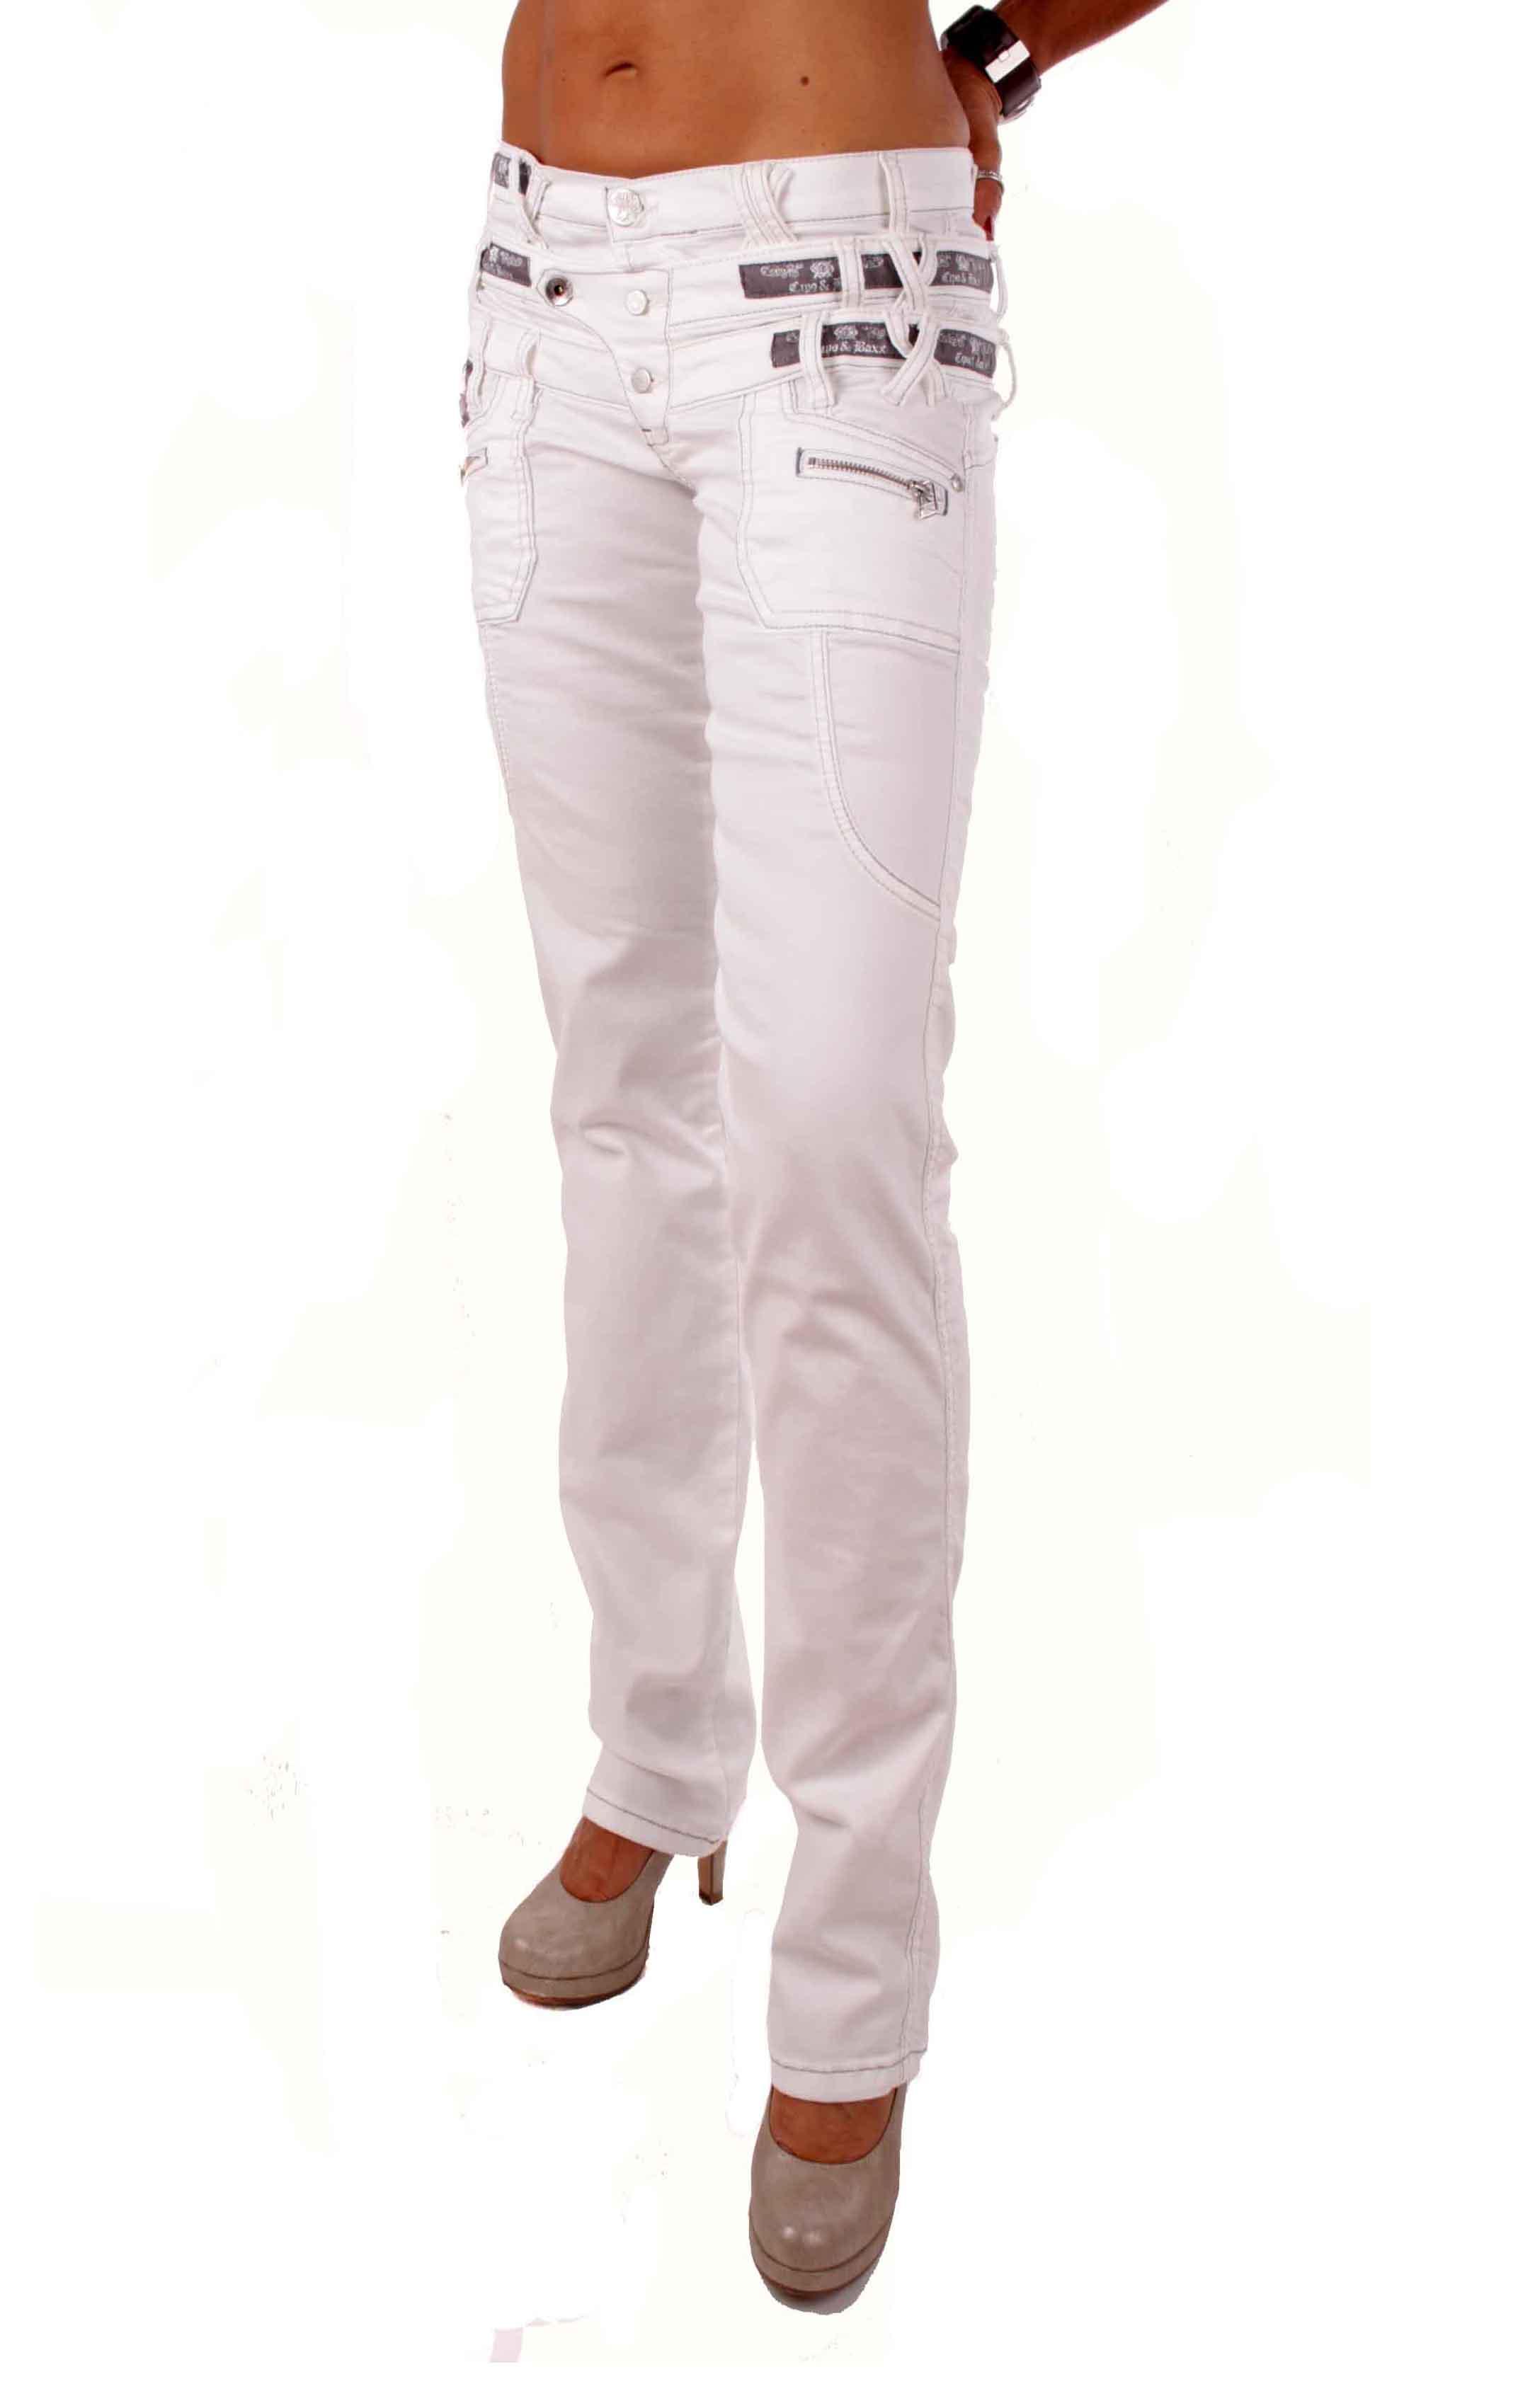 cipo baxx damen jeans hose 3 bund jeans cbw 0245 wei ebay. Black Bedroom Furniture Sets. Home Design Ideas